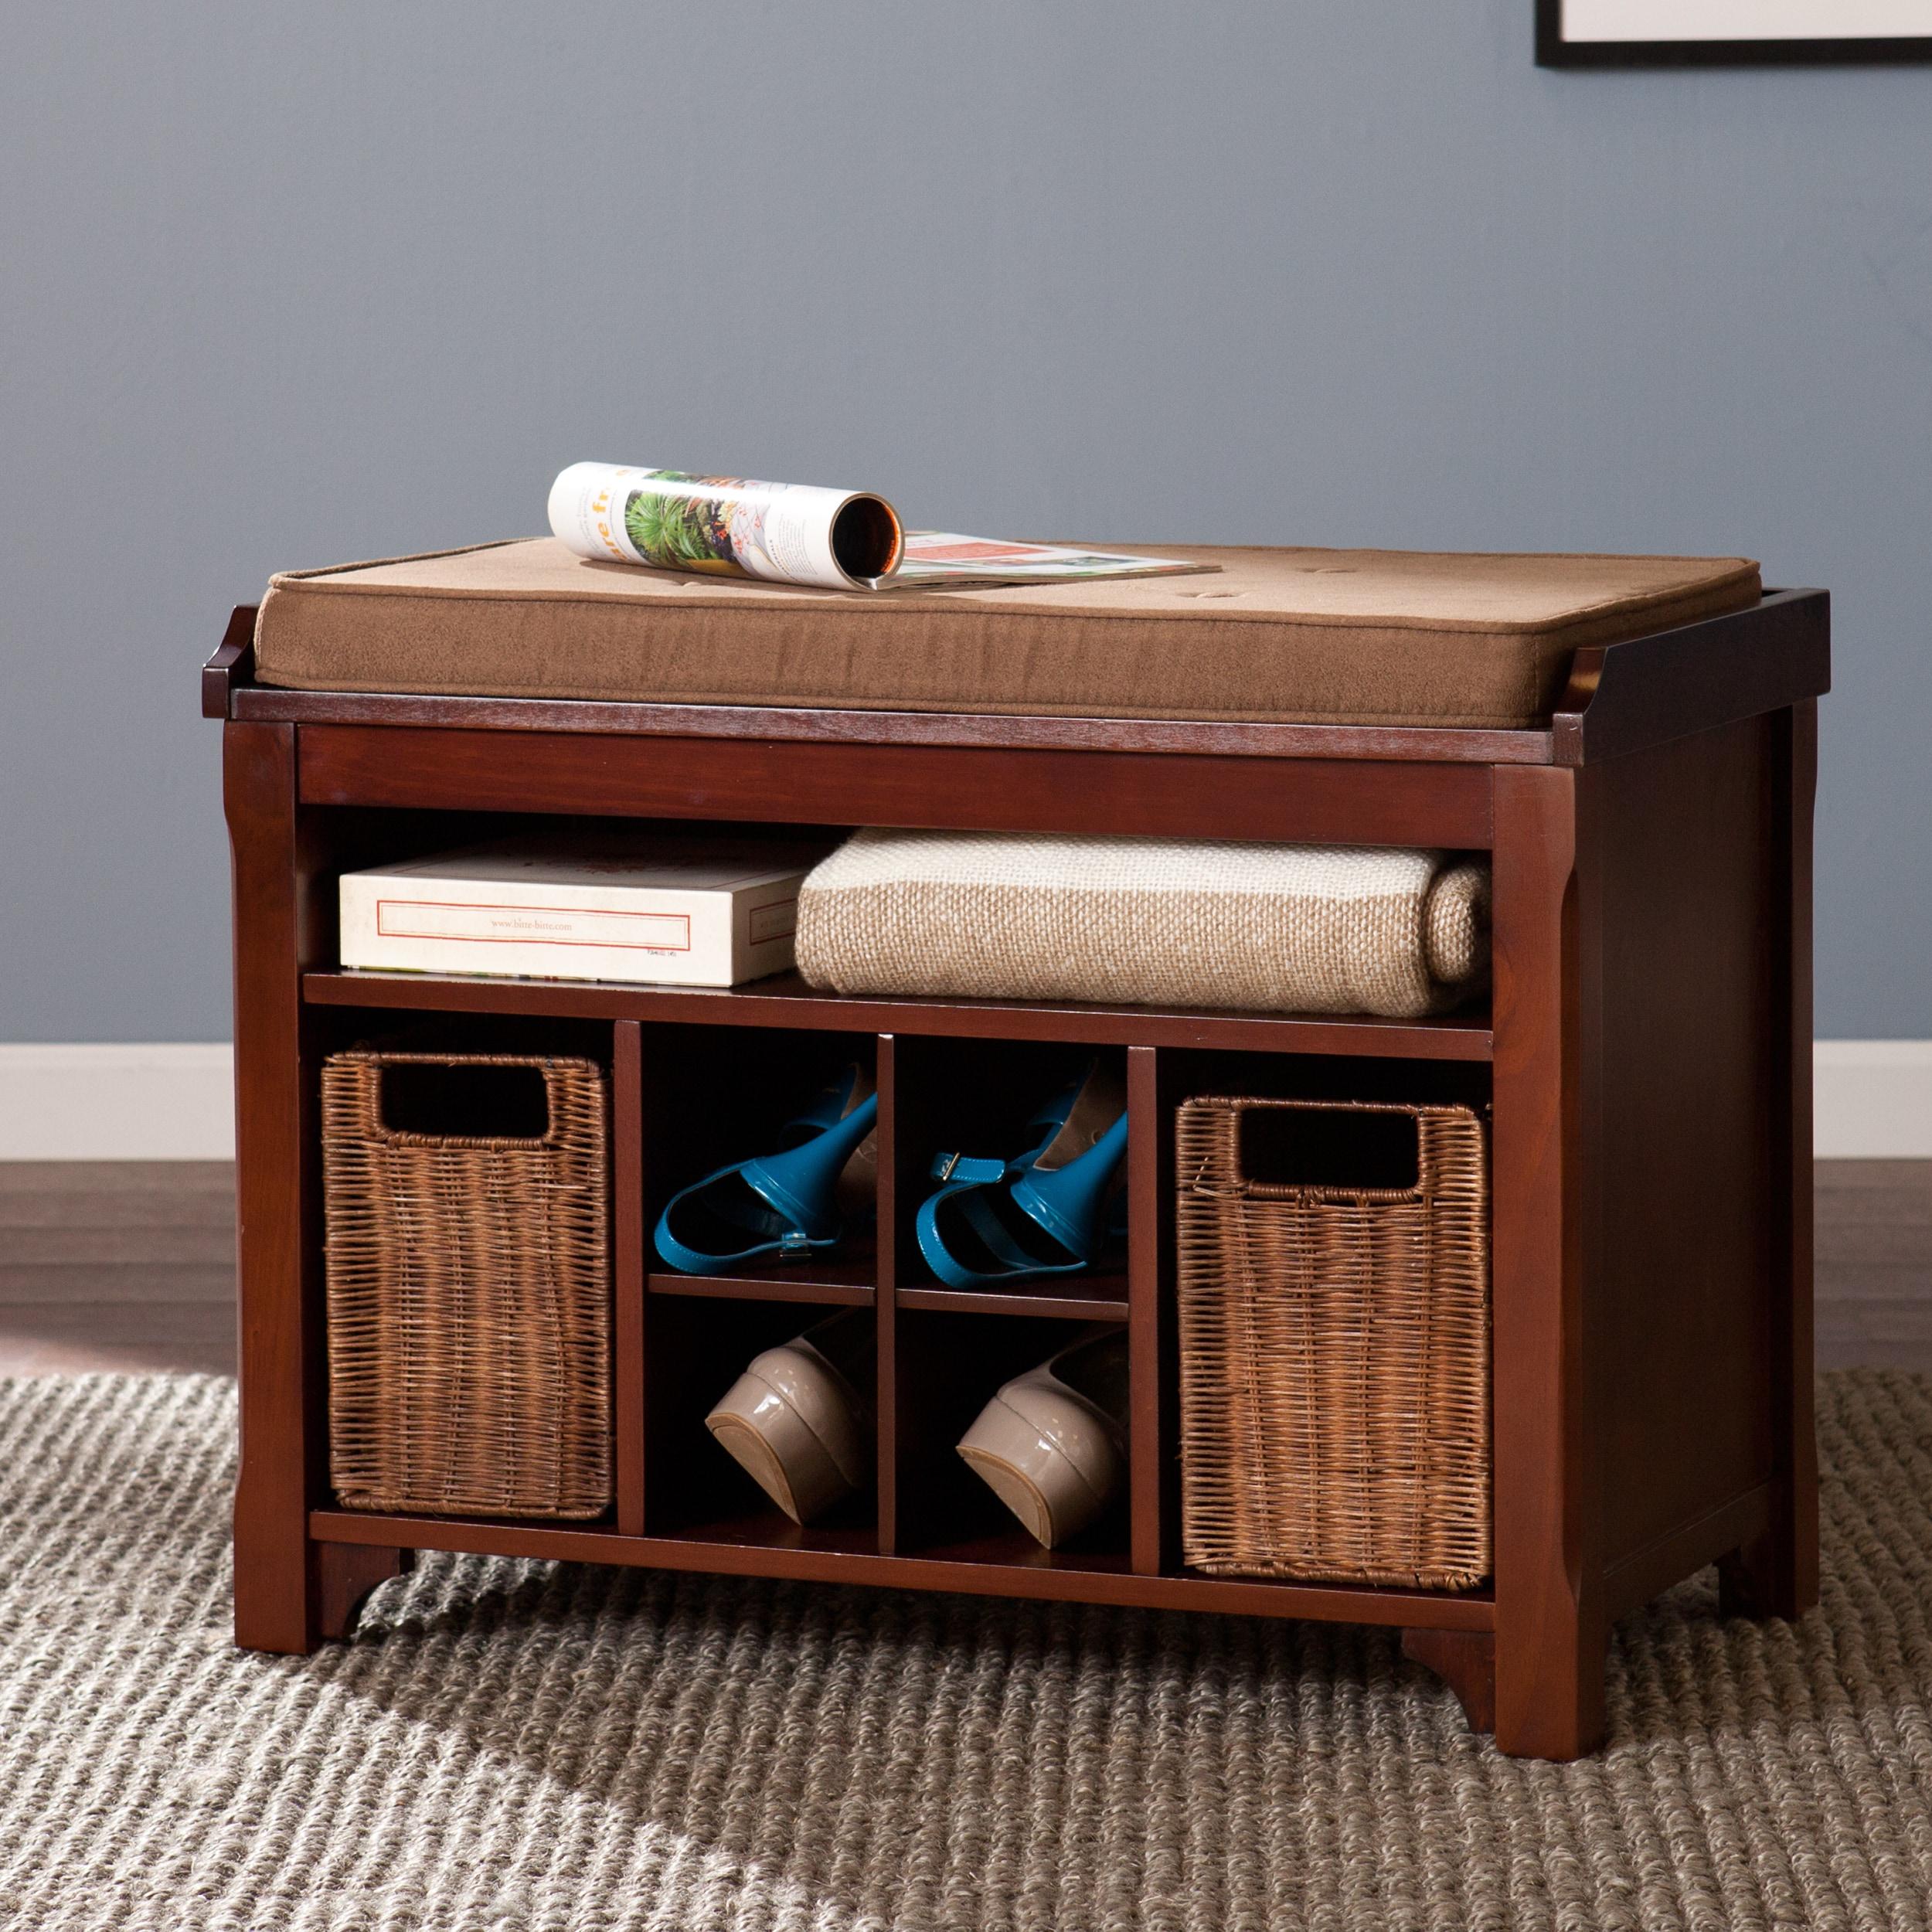 Strange Harper Blvd Fallon Espresso Storage Bench Lamtechconsult Wood Chair Design Ideas Lamtechconsultcom